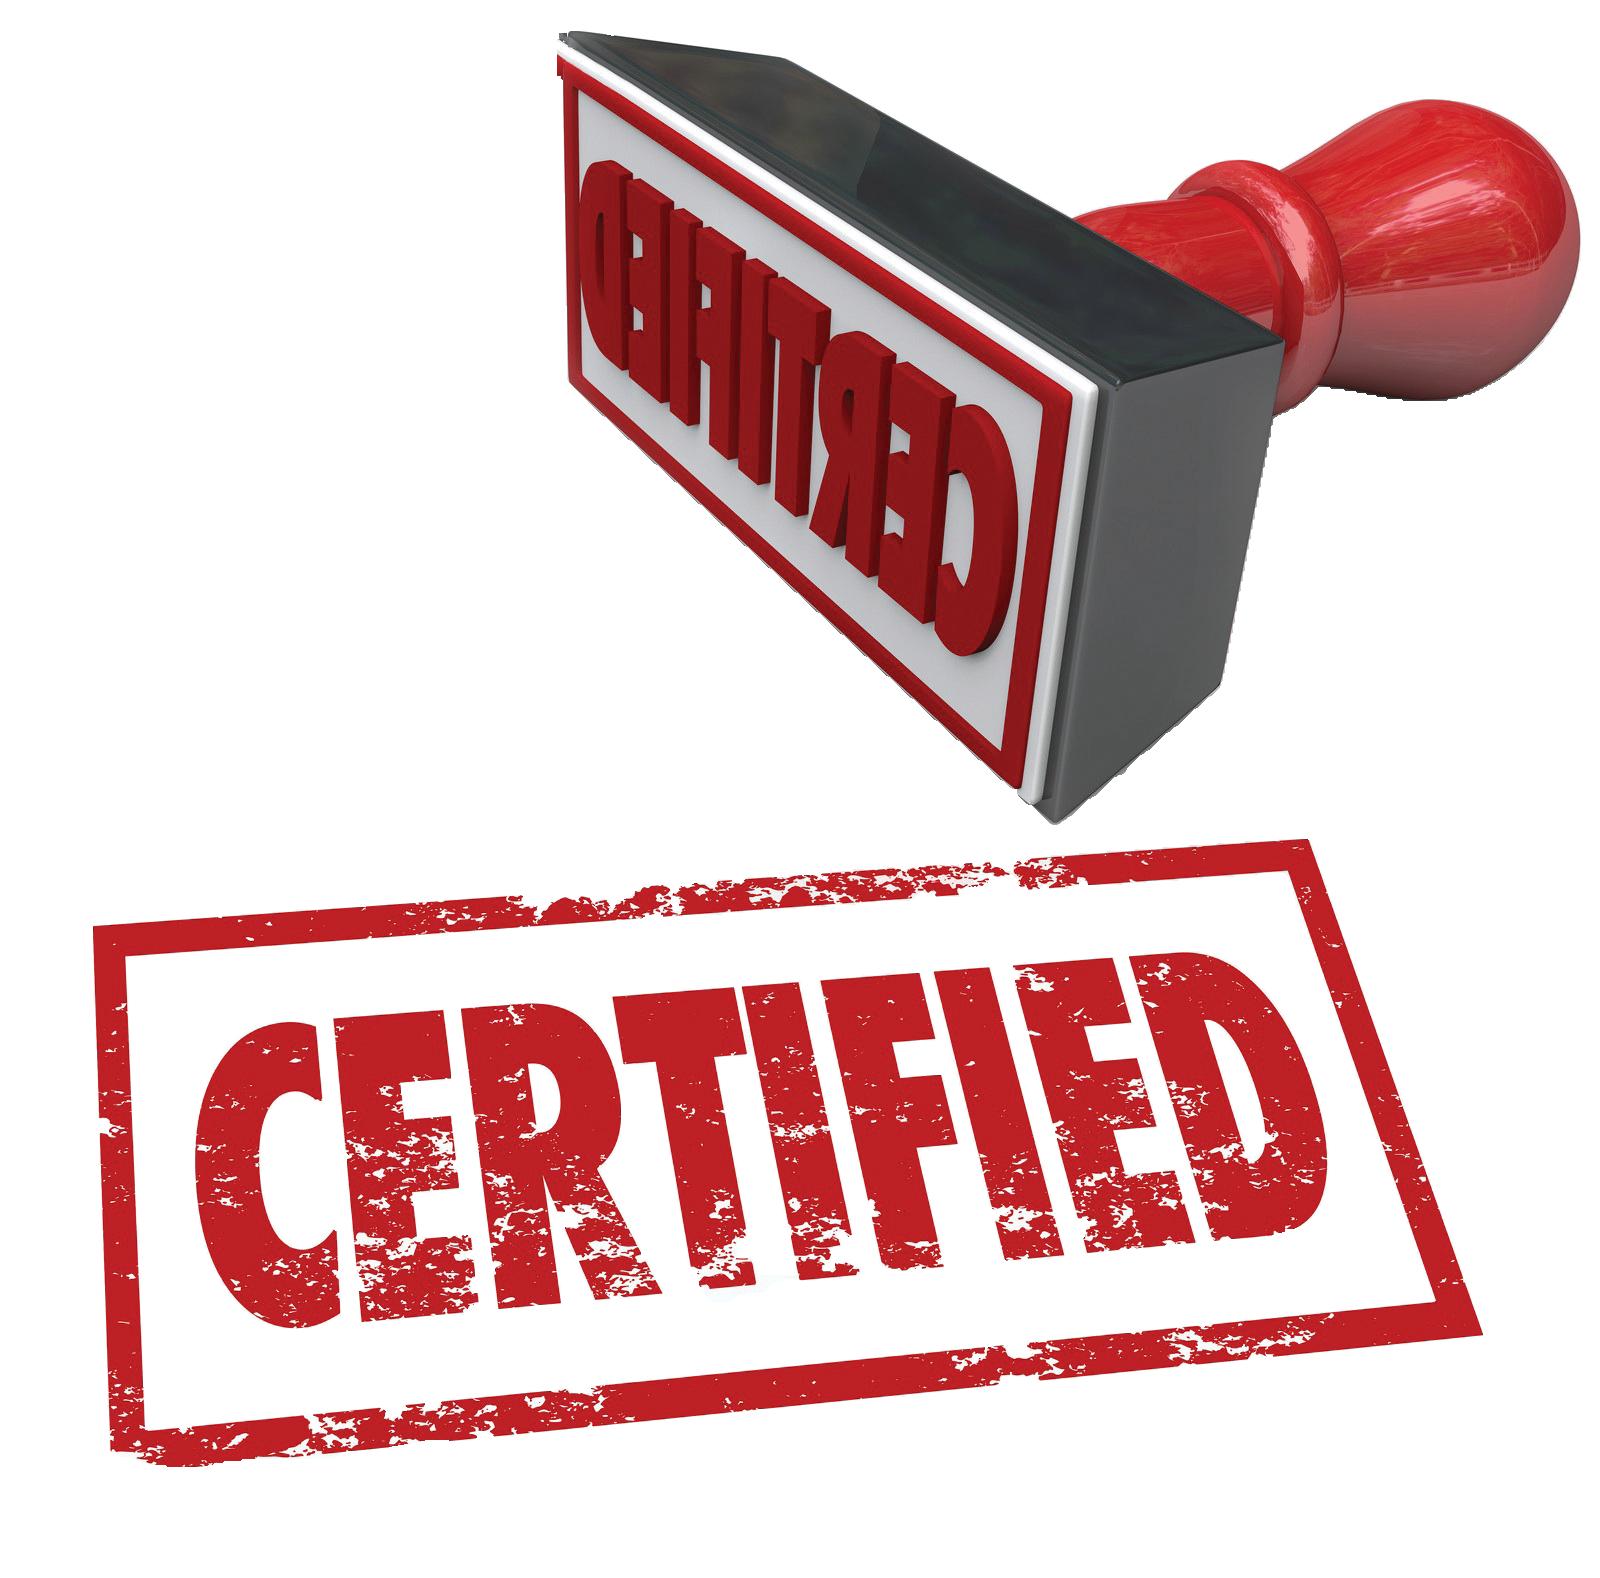 Certified Image Stamp Png 1600 1578 Translation Image Stamp Language Translation